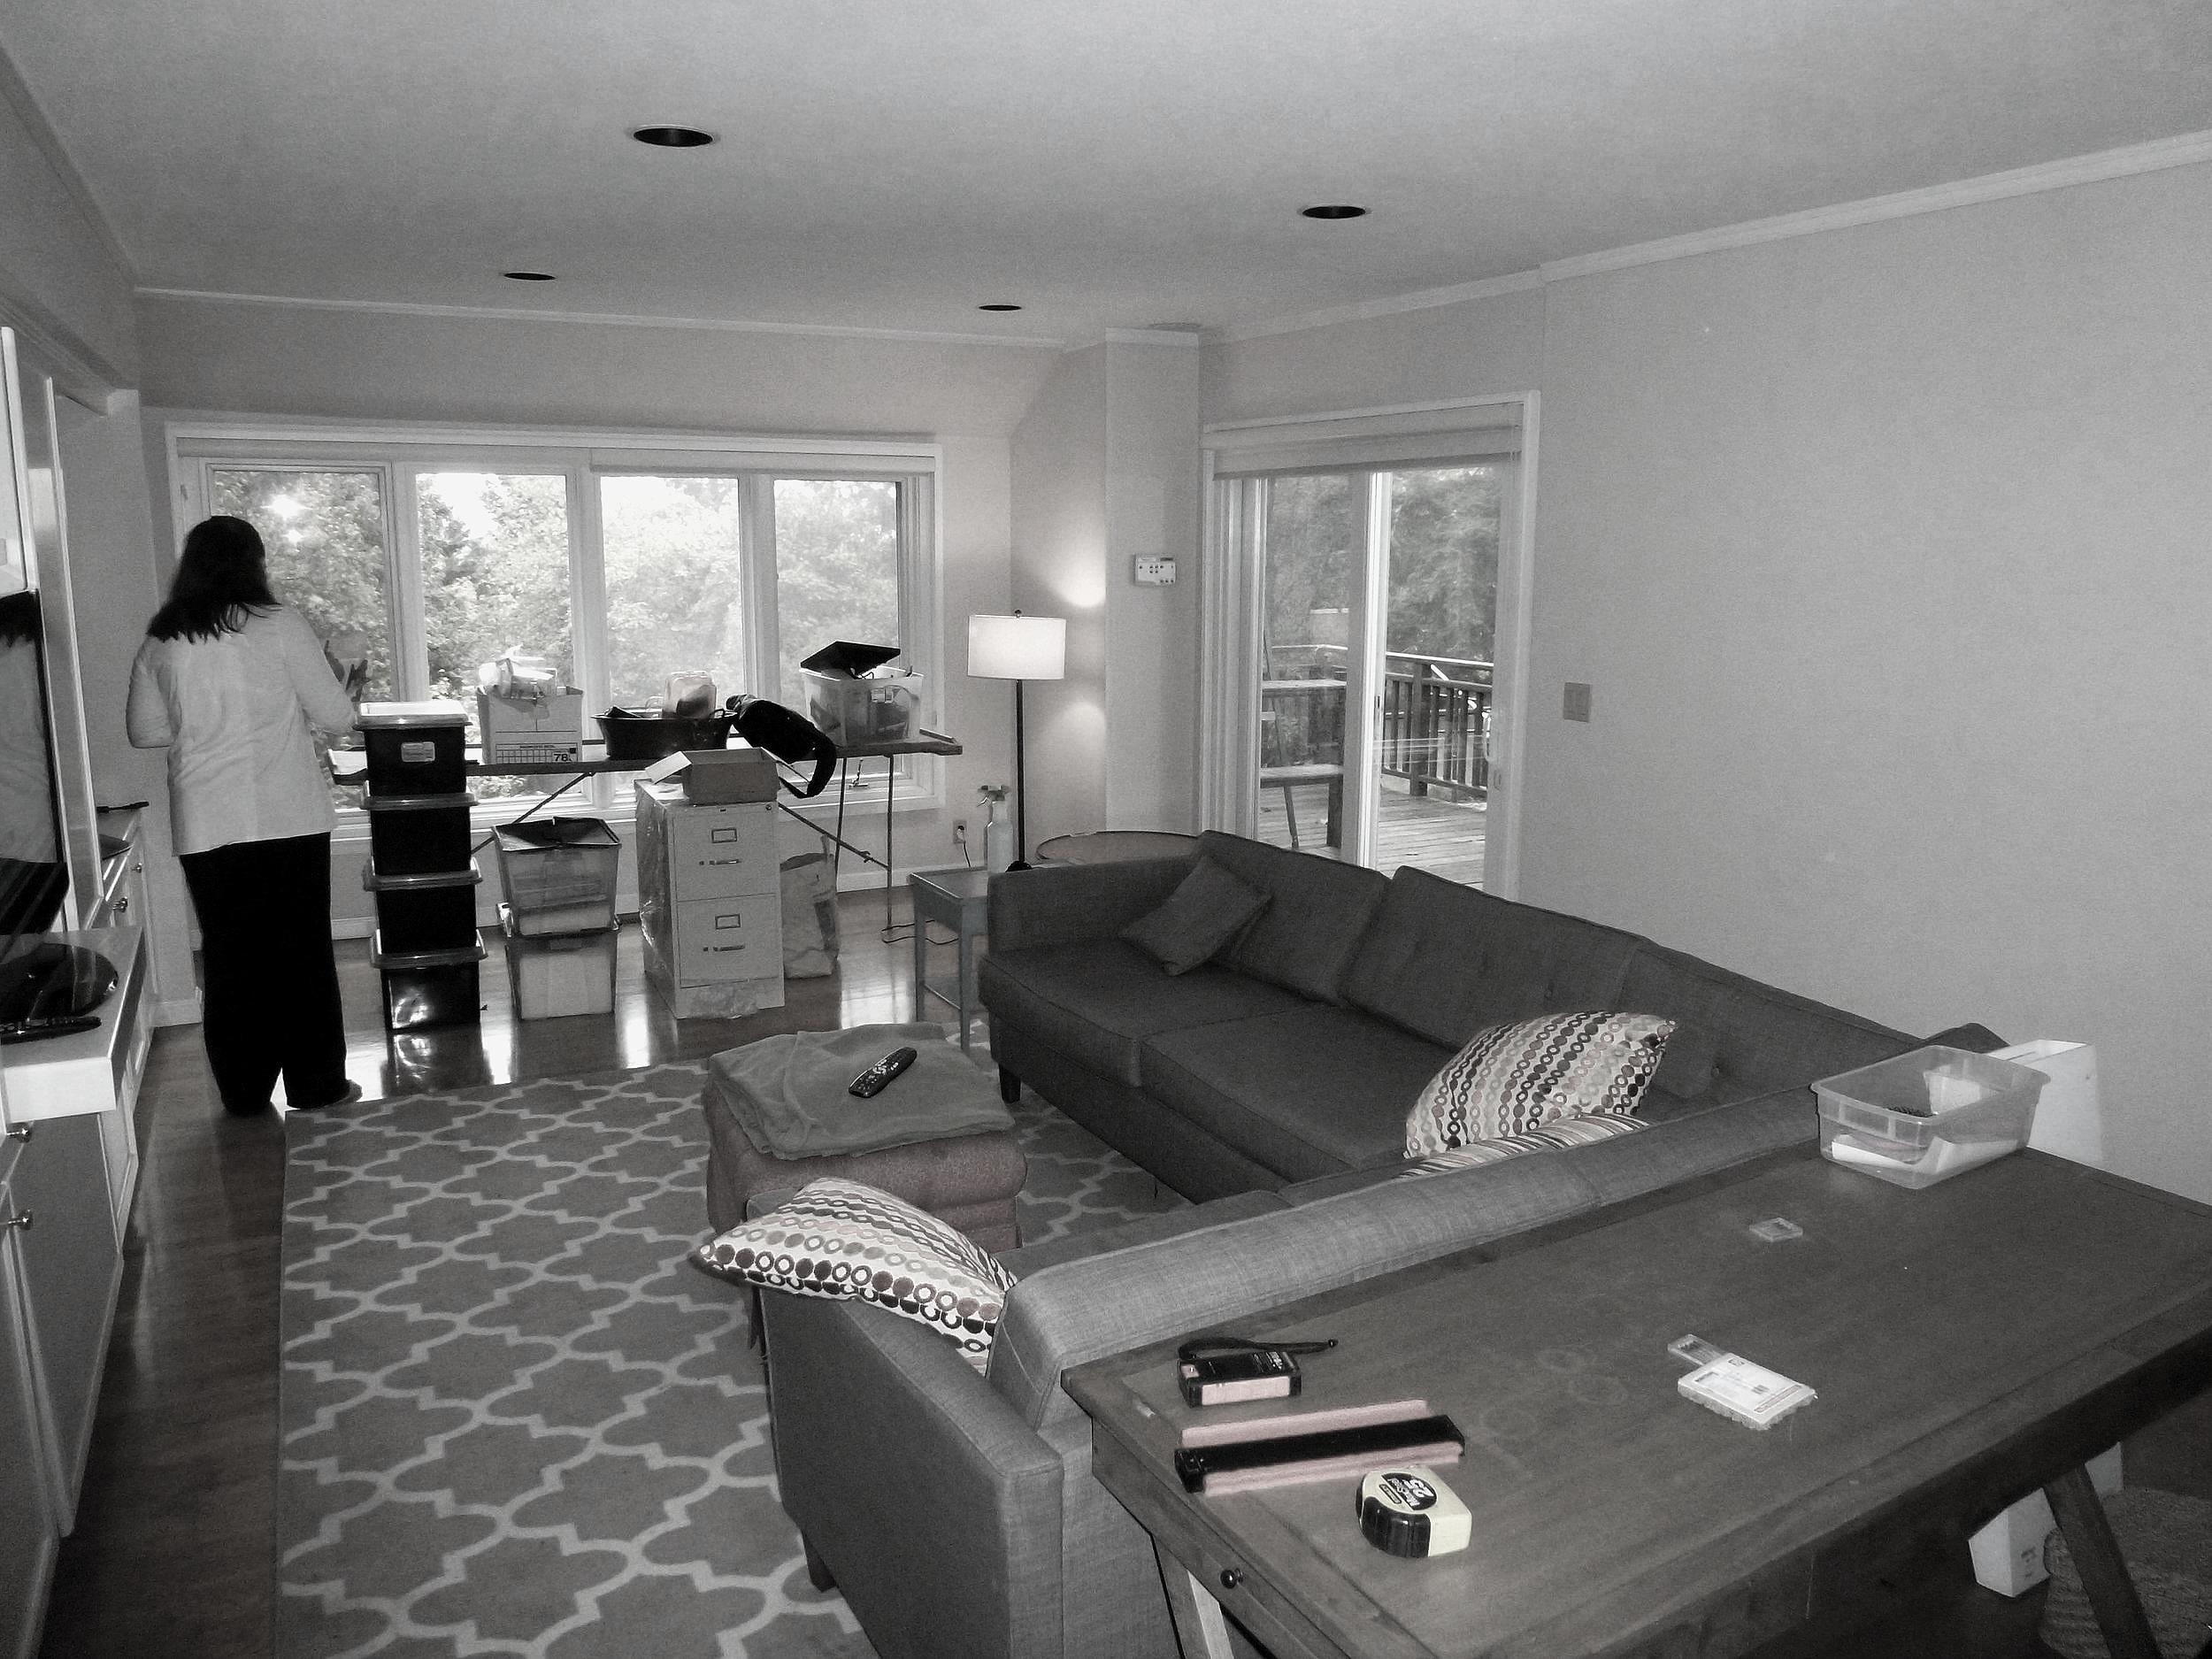 Family Room - Before